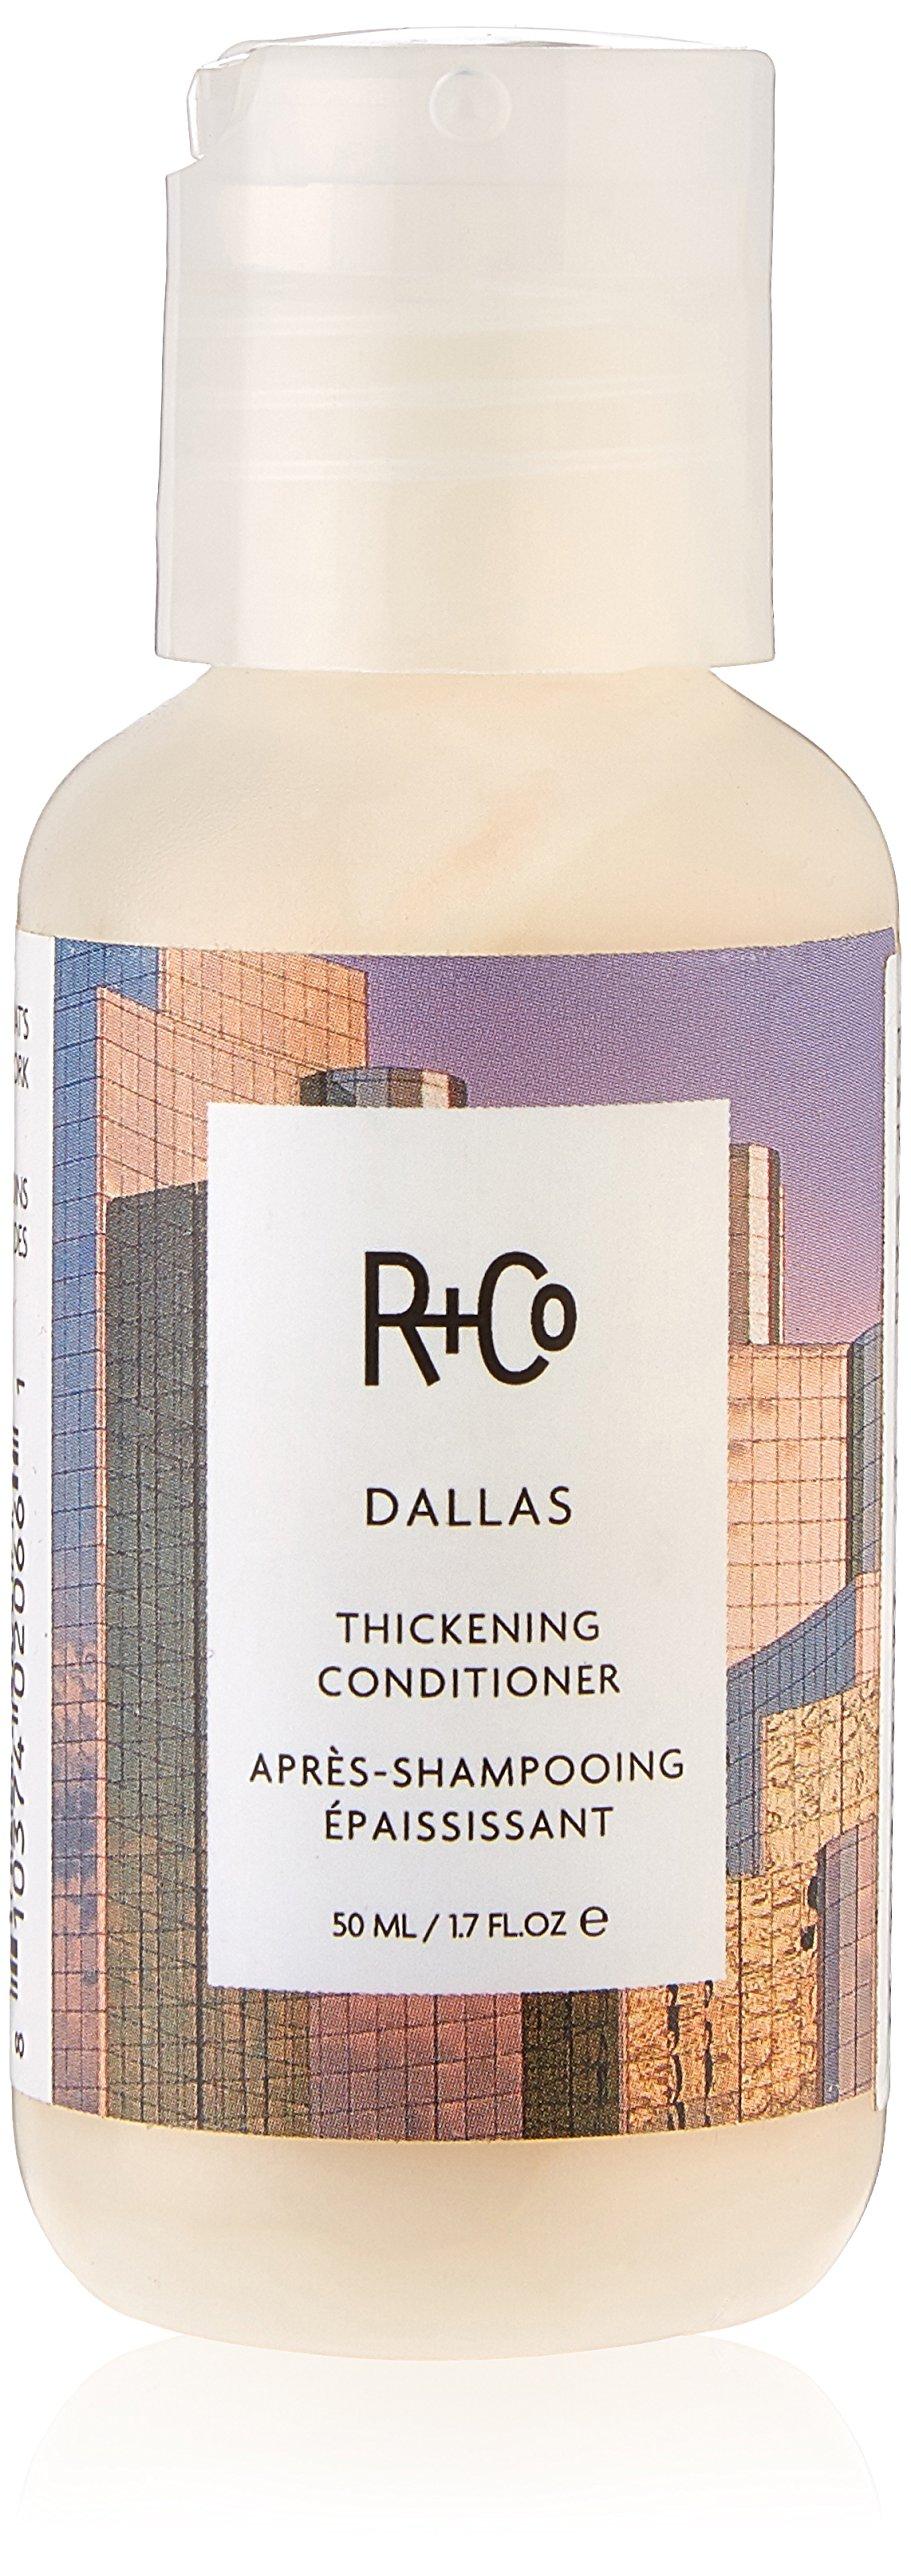 R+Co Dallas Travel Size Thickening Conditioner, 1.7 oz.